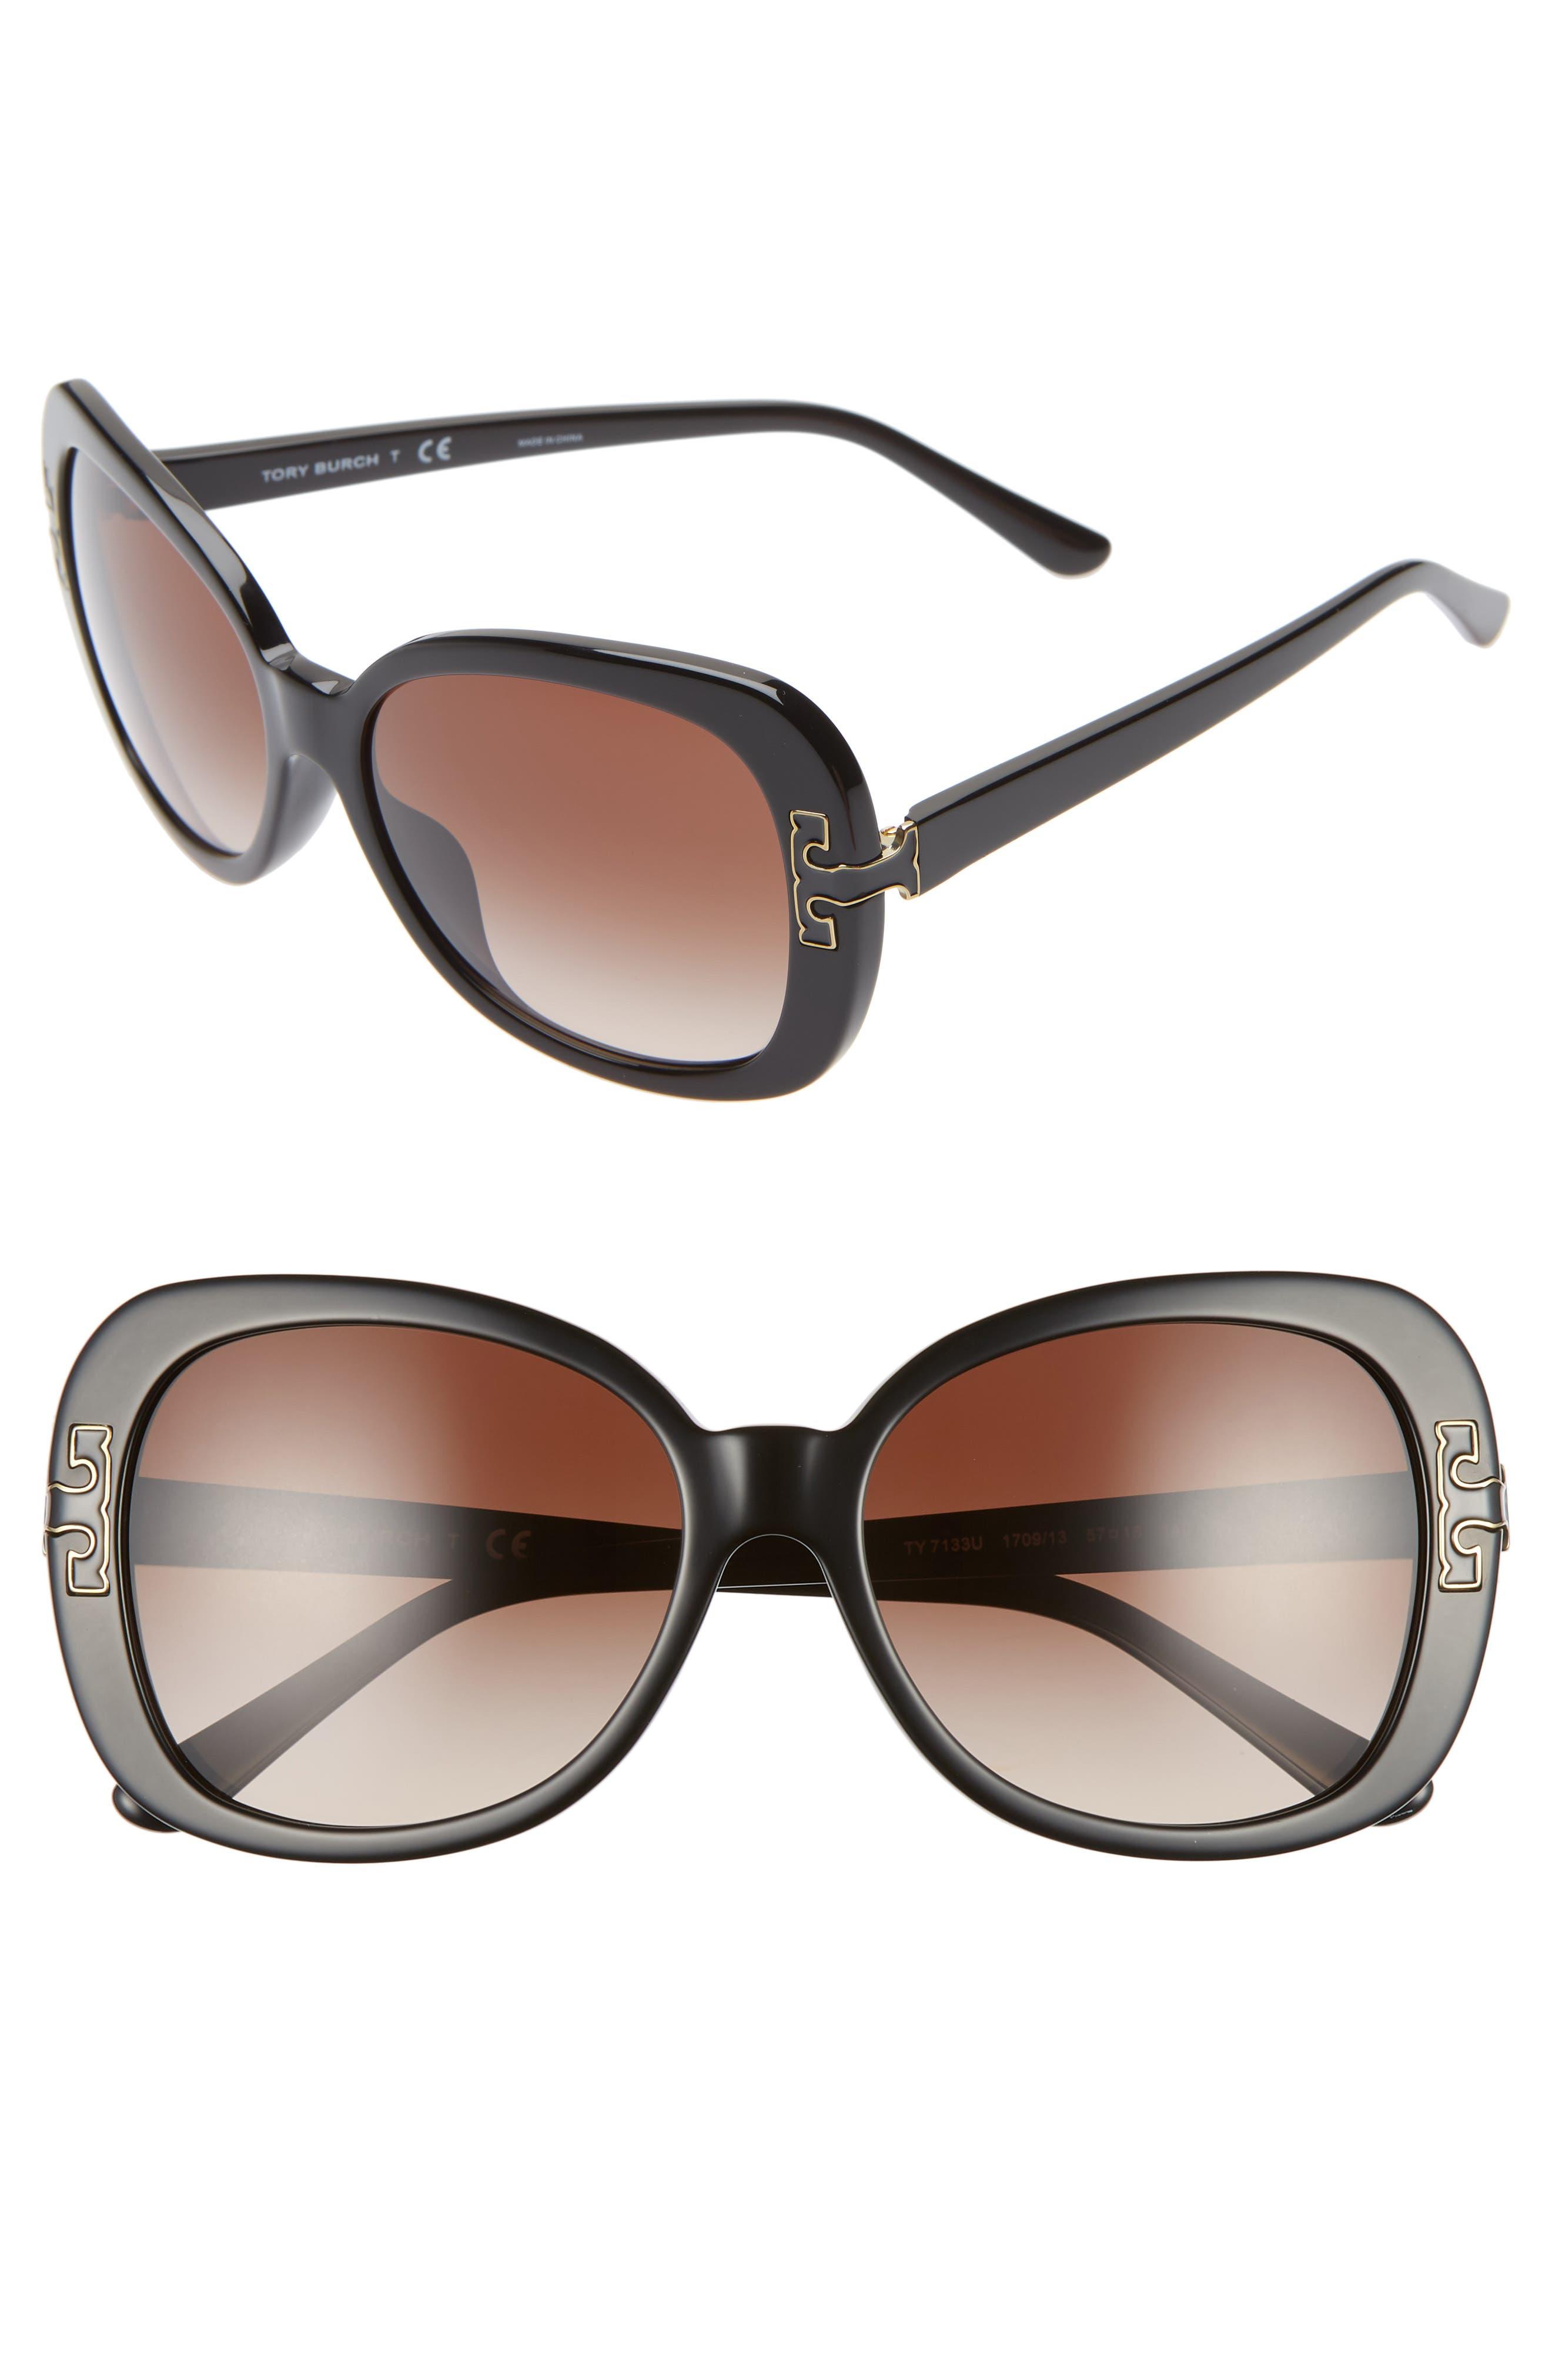 TORY BURCH, 57mm Logo T Square Sunglasses, Main thumbnail 1, color, BLACK GRADIENT